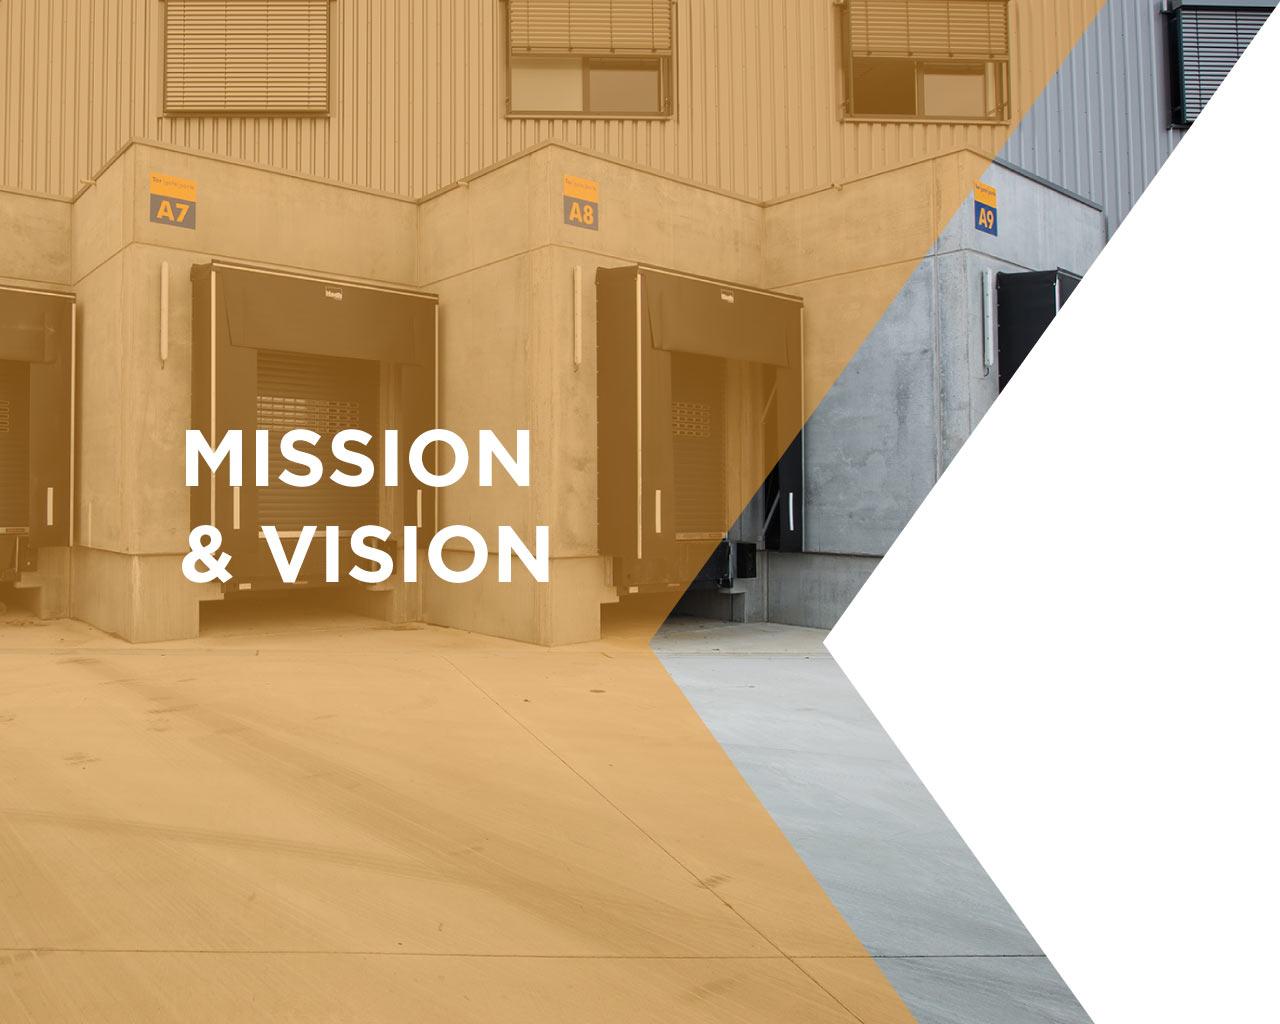 logistics mission and vision